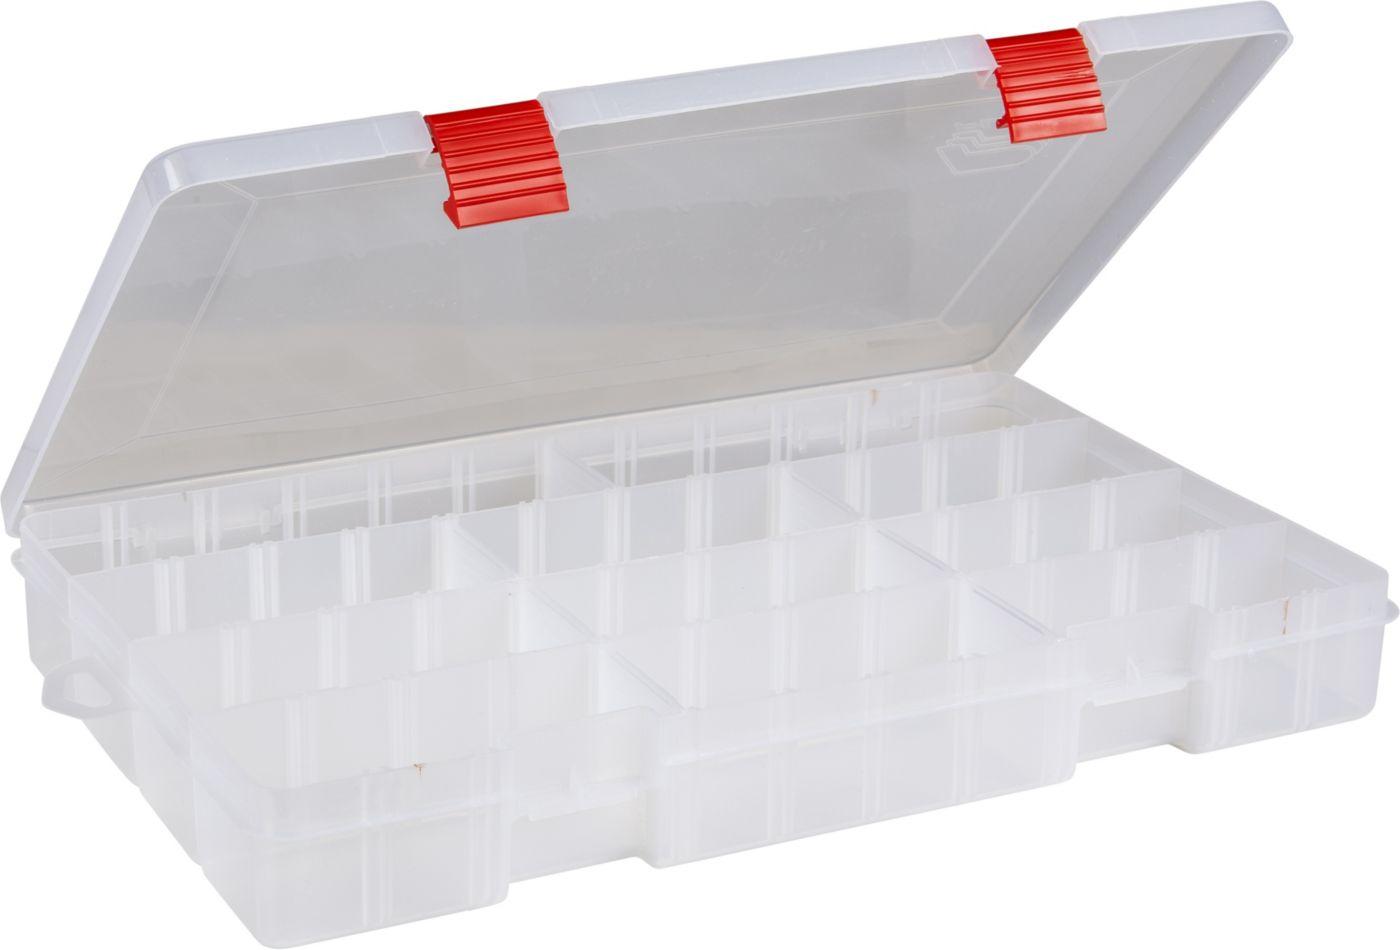 Plano Rustrictor 3700 Utility Box